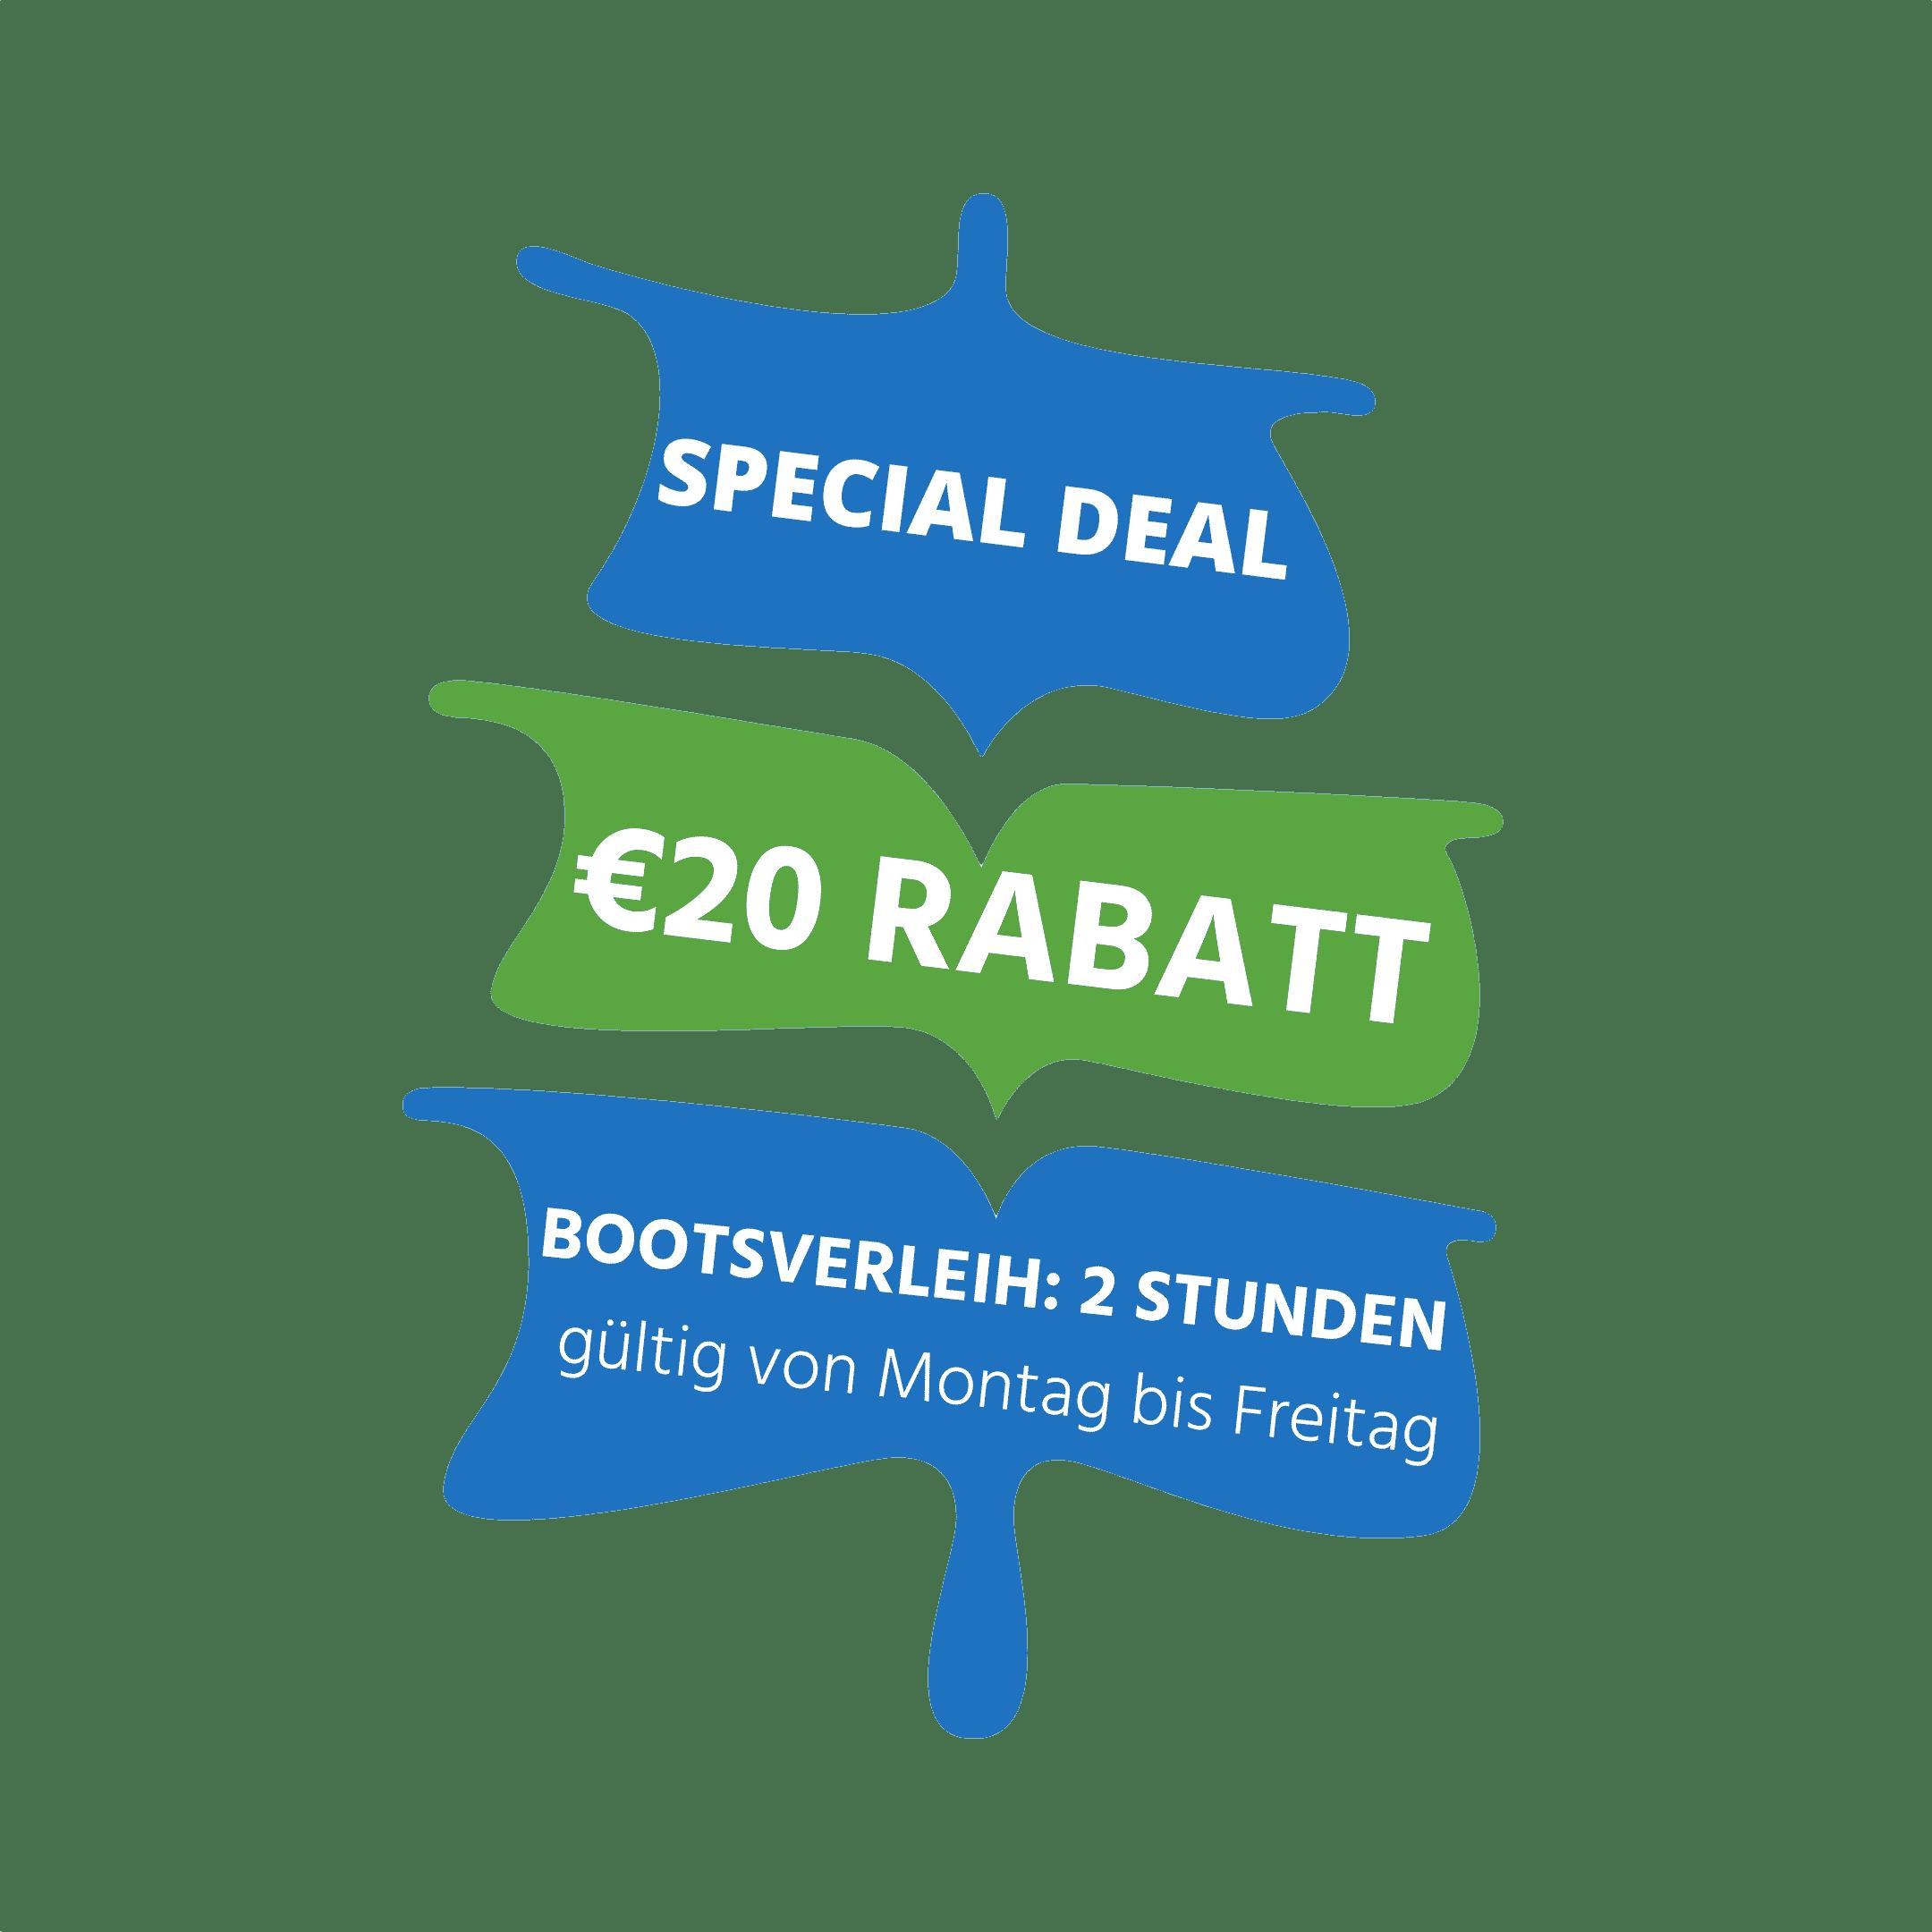 Bootsvermietung amsterdam Rabatt